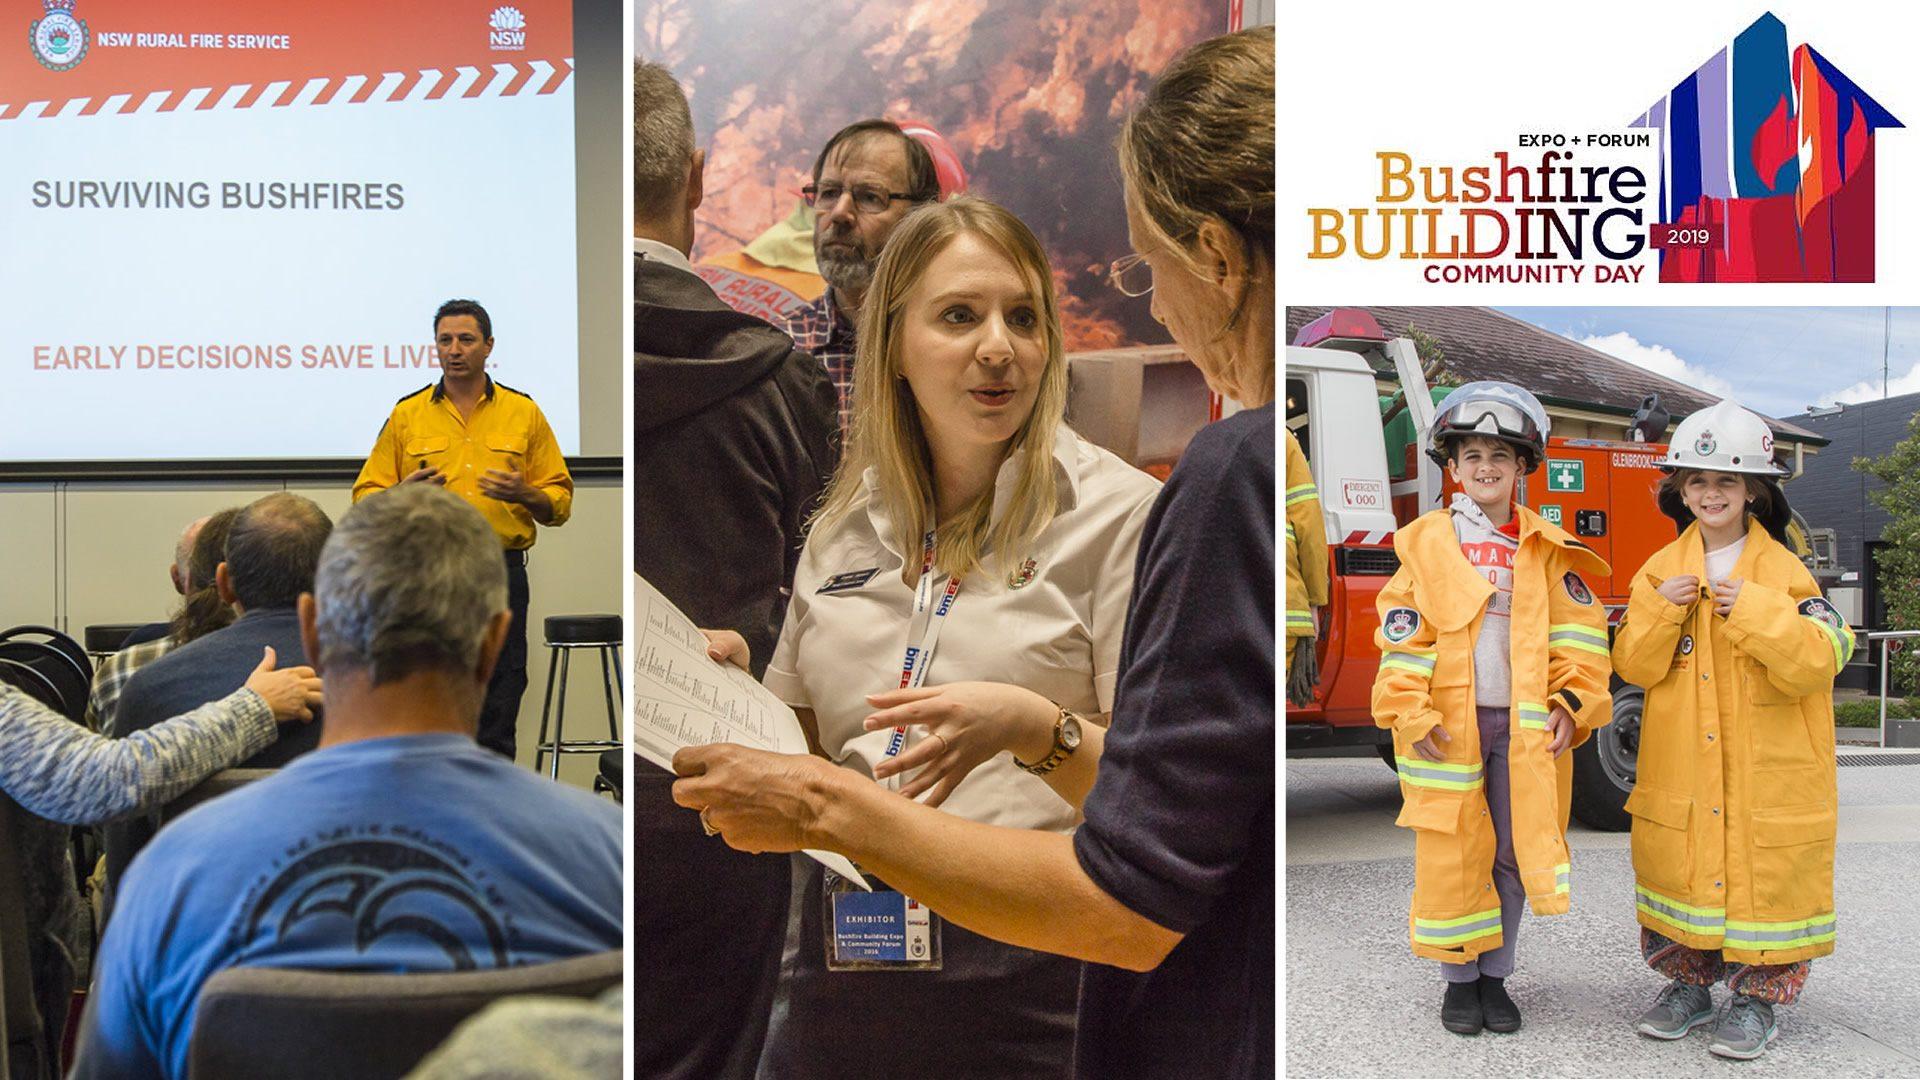 Bushfire Building Community Day, 07 September 2019